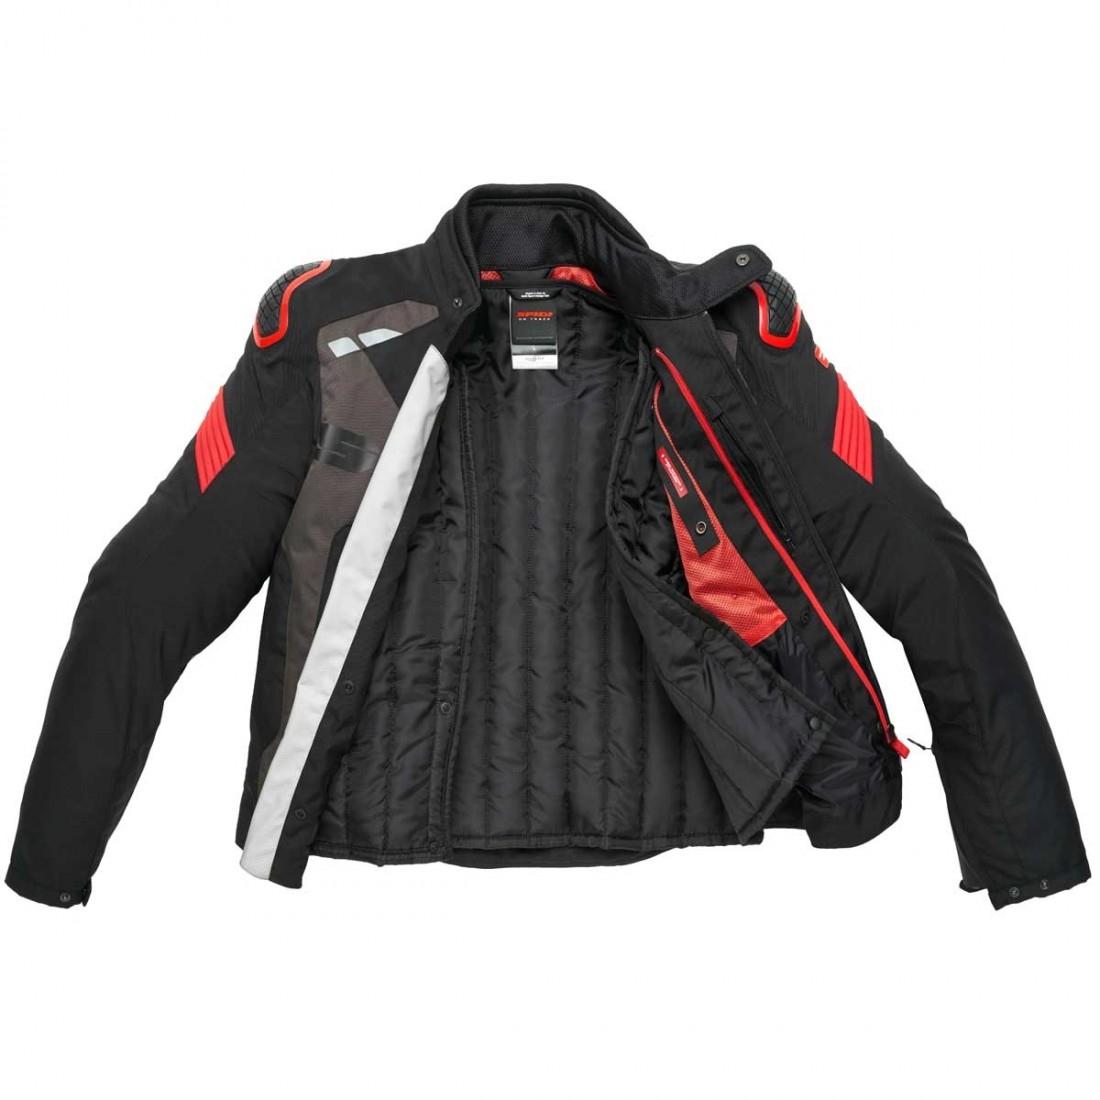 f5996880bcf2 SPIDI Warrior H2Out Black / Red Jacket · Motocard